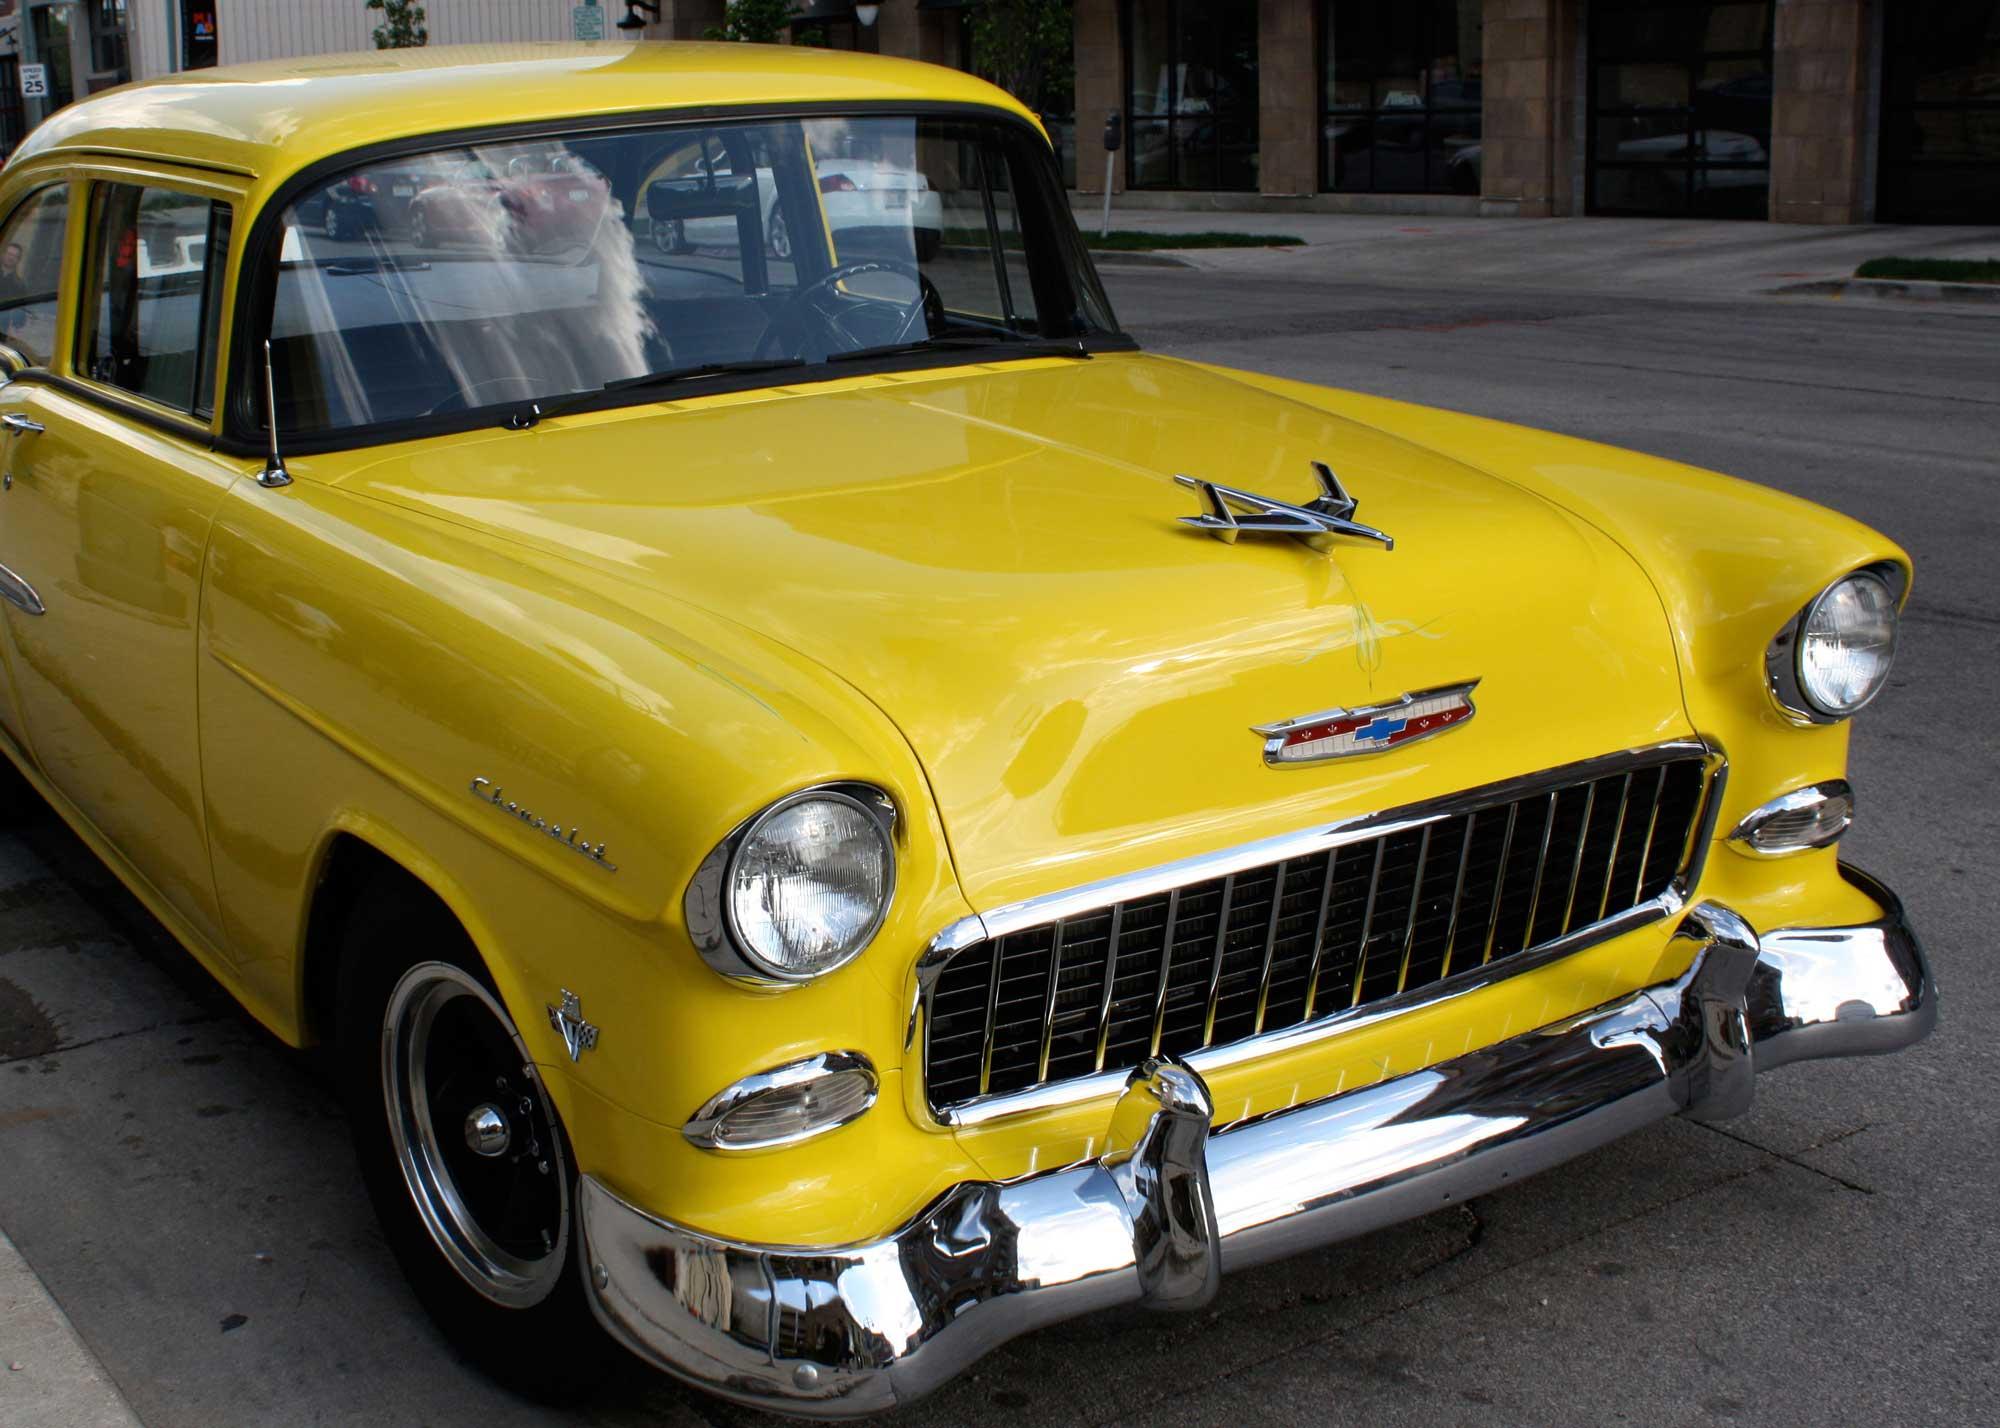 124_Yellow-Chevy_rgb_opt_web.jpg